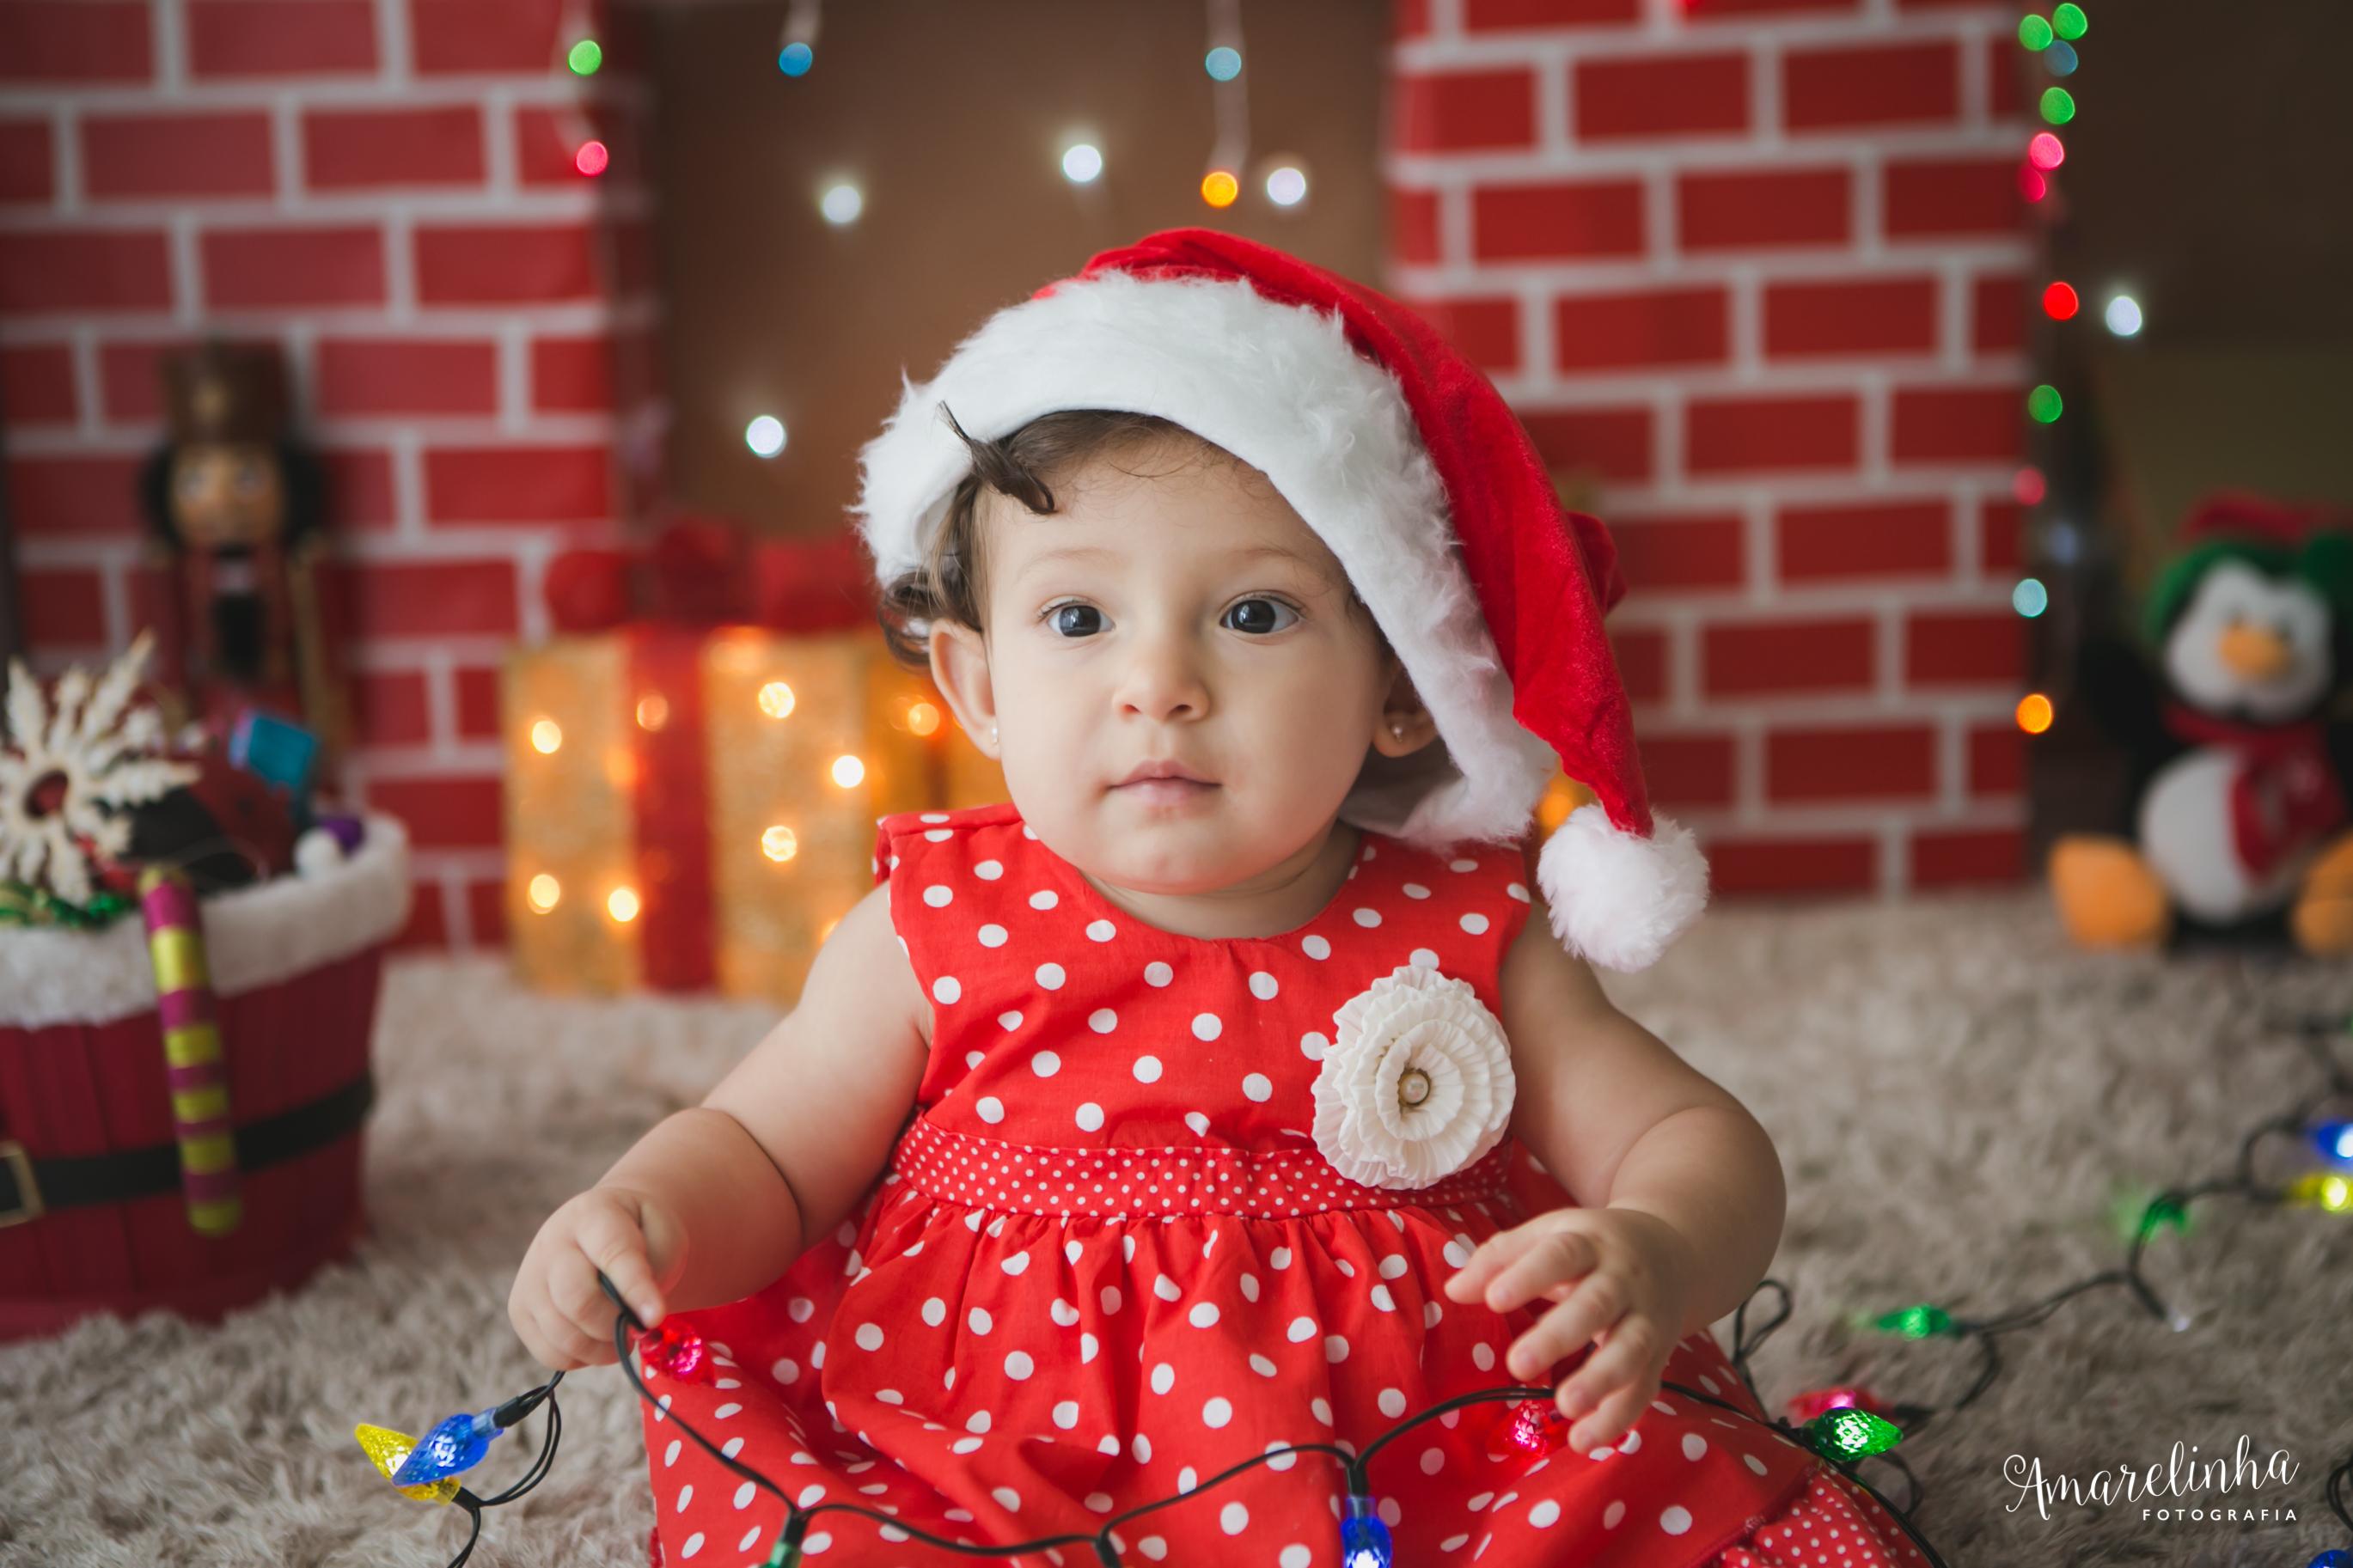 amarelinha-fotografia-mini-ensaio-de-natal-2016-7245